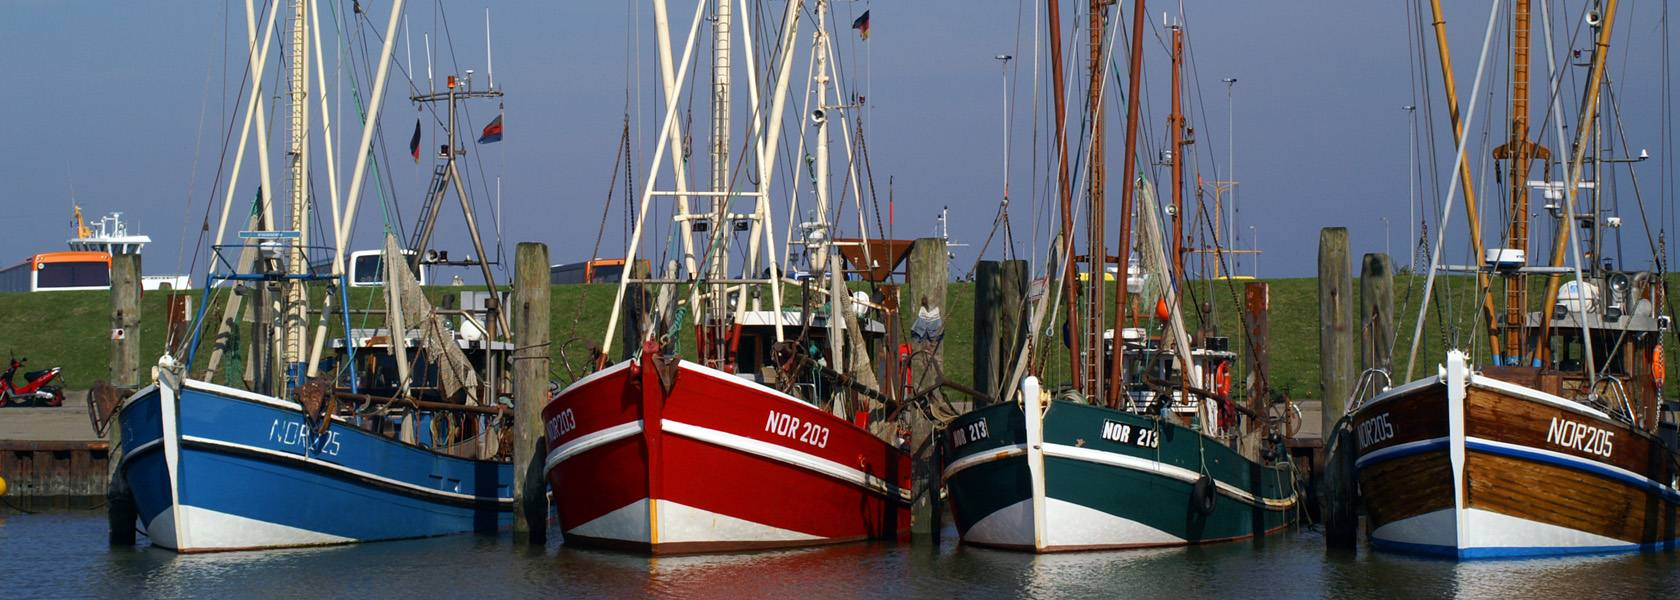 Krabbenkutter im Hafen, © Anne Katrin Figge/ Fotolia